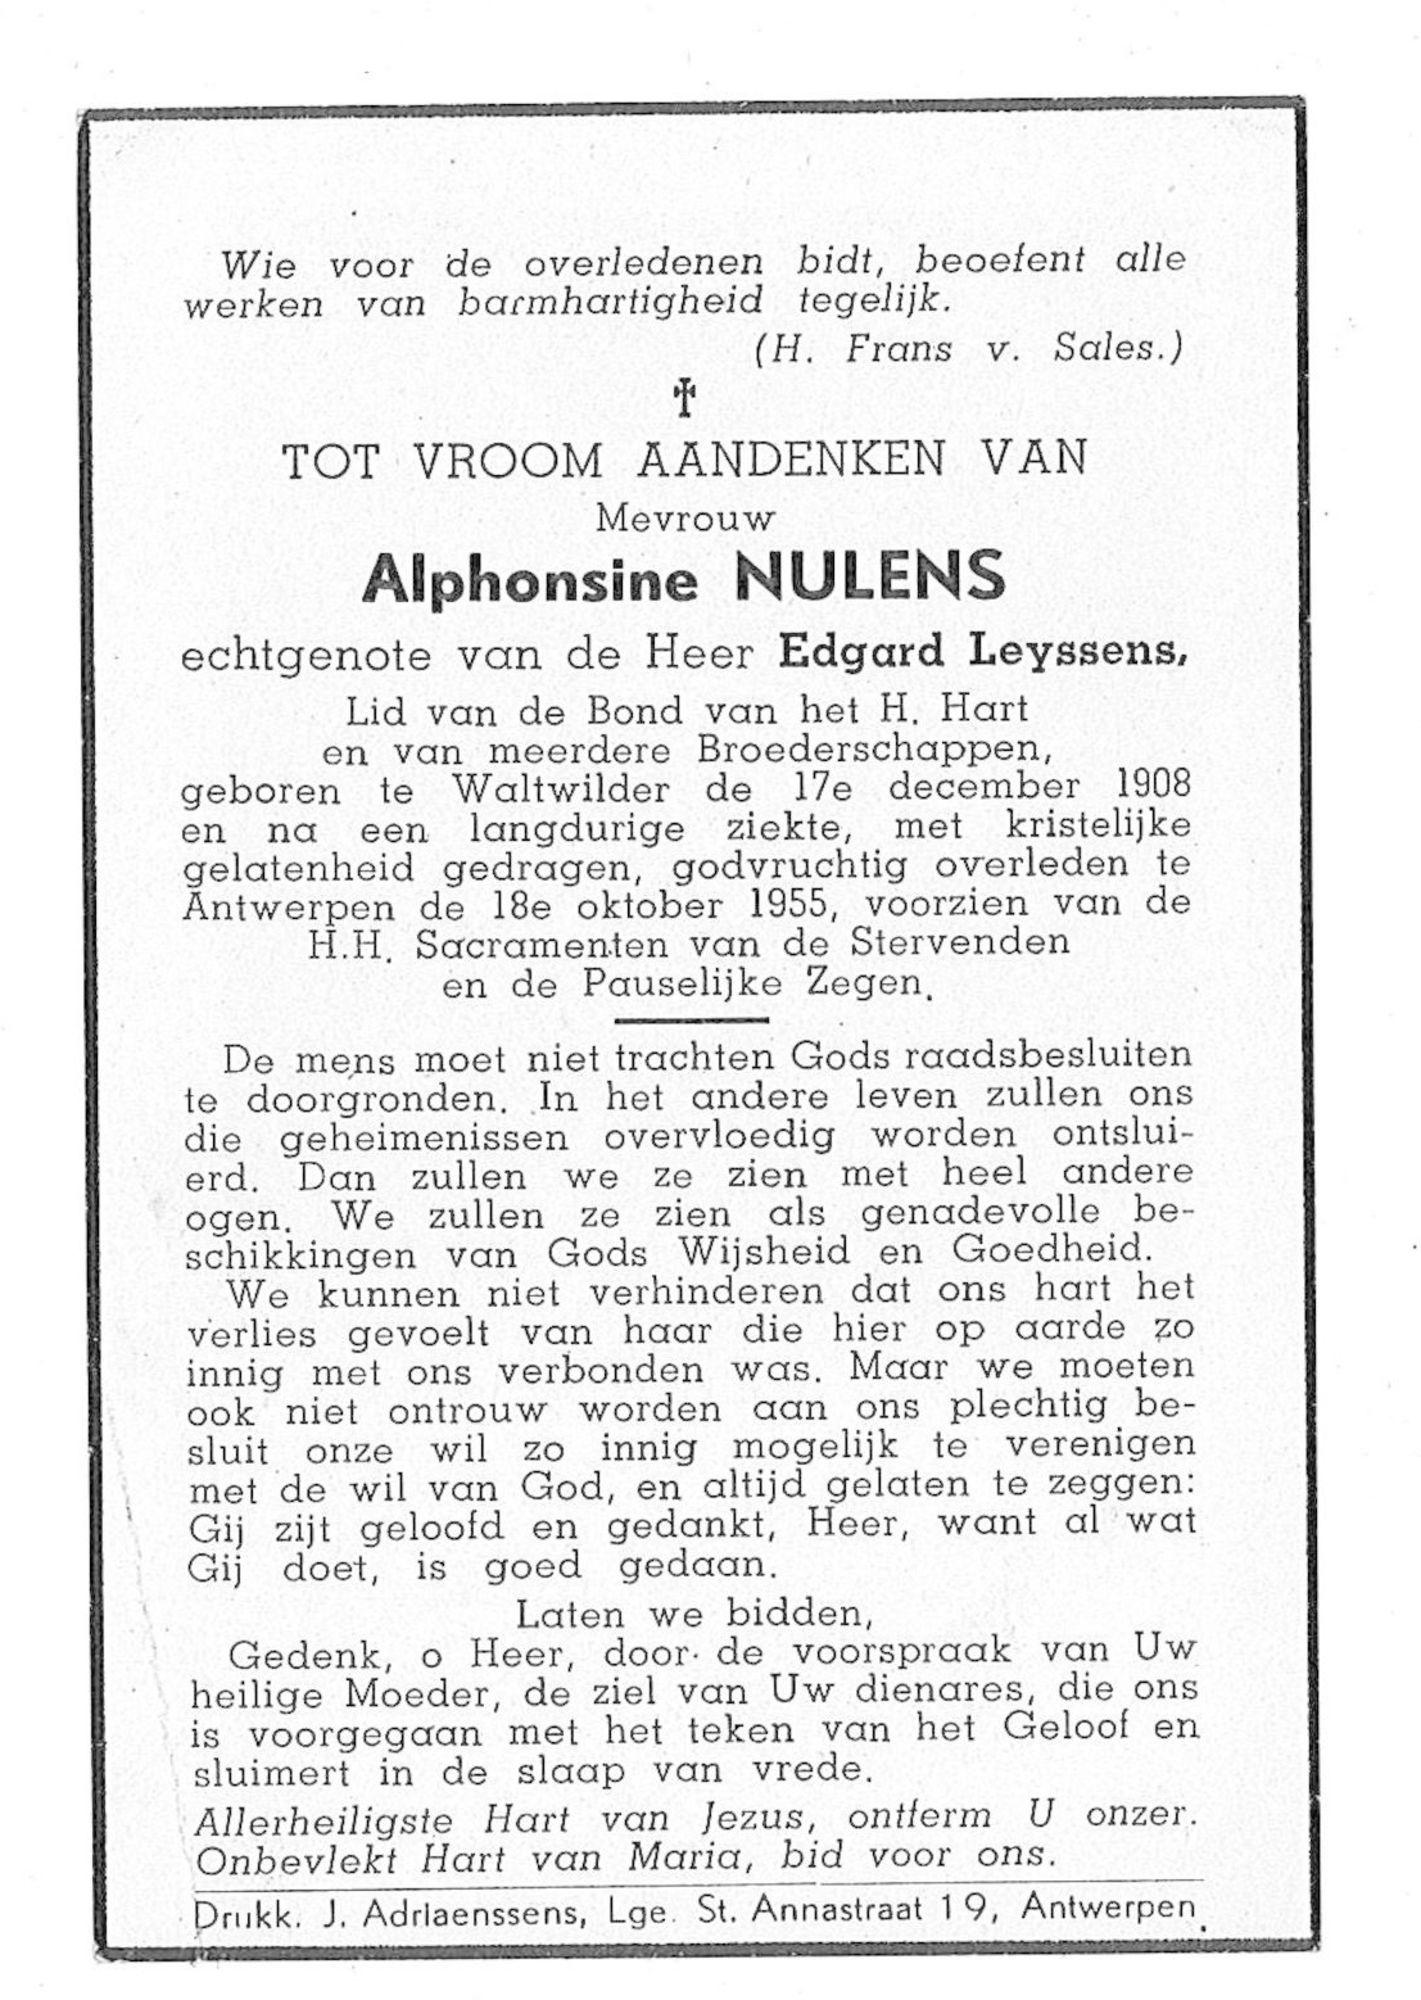 Alphonsine Nulens